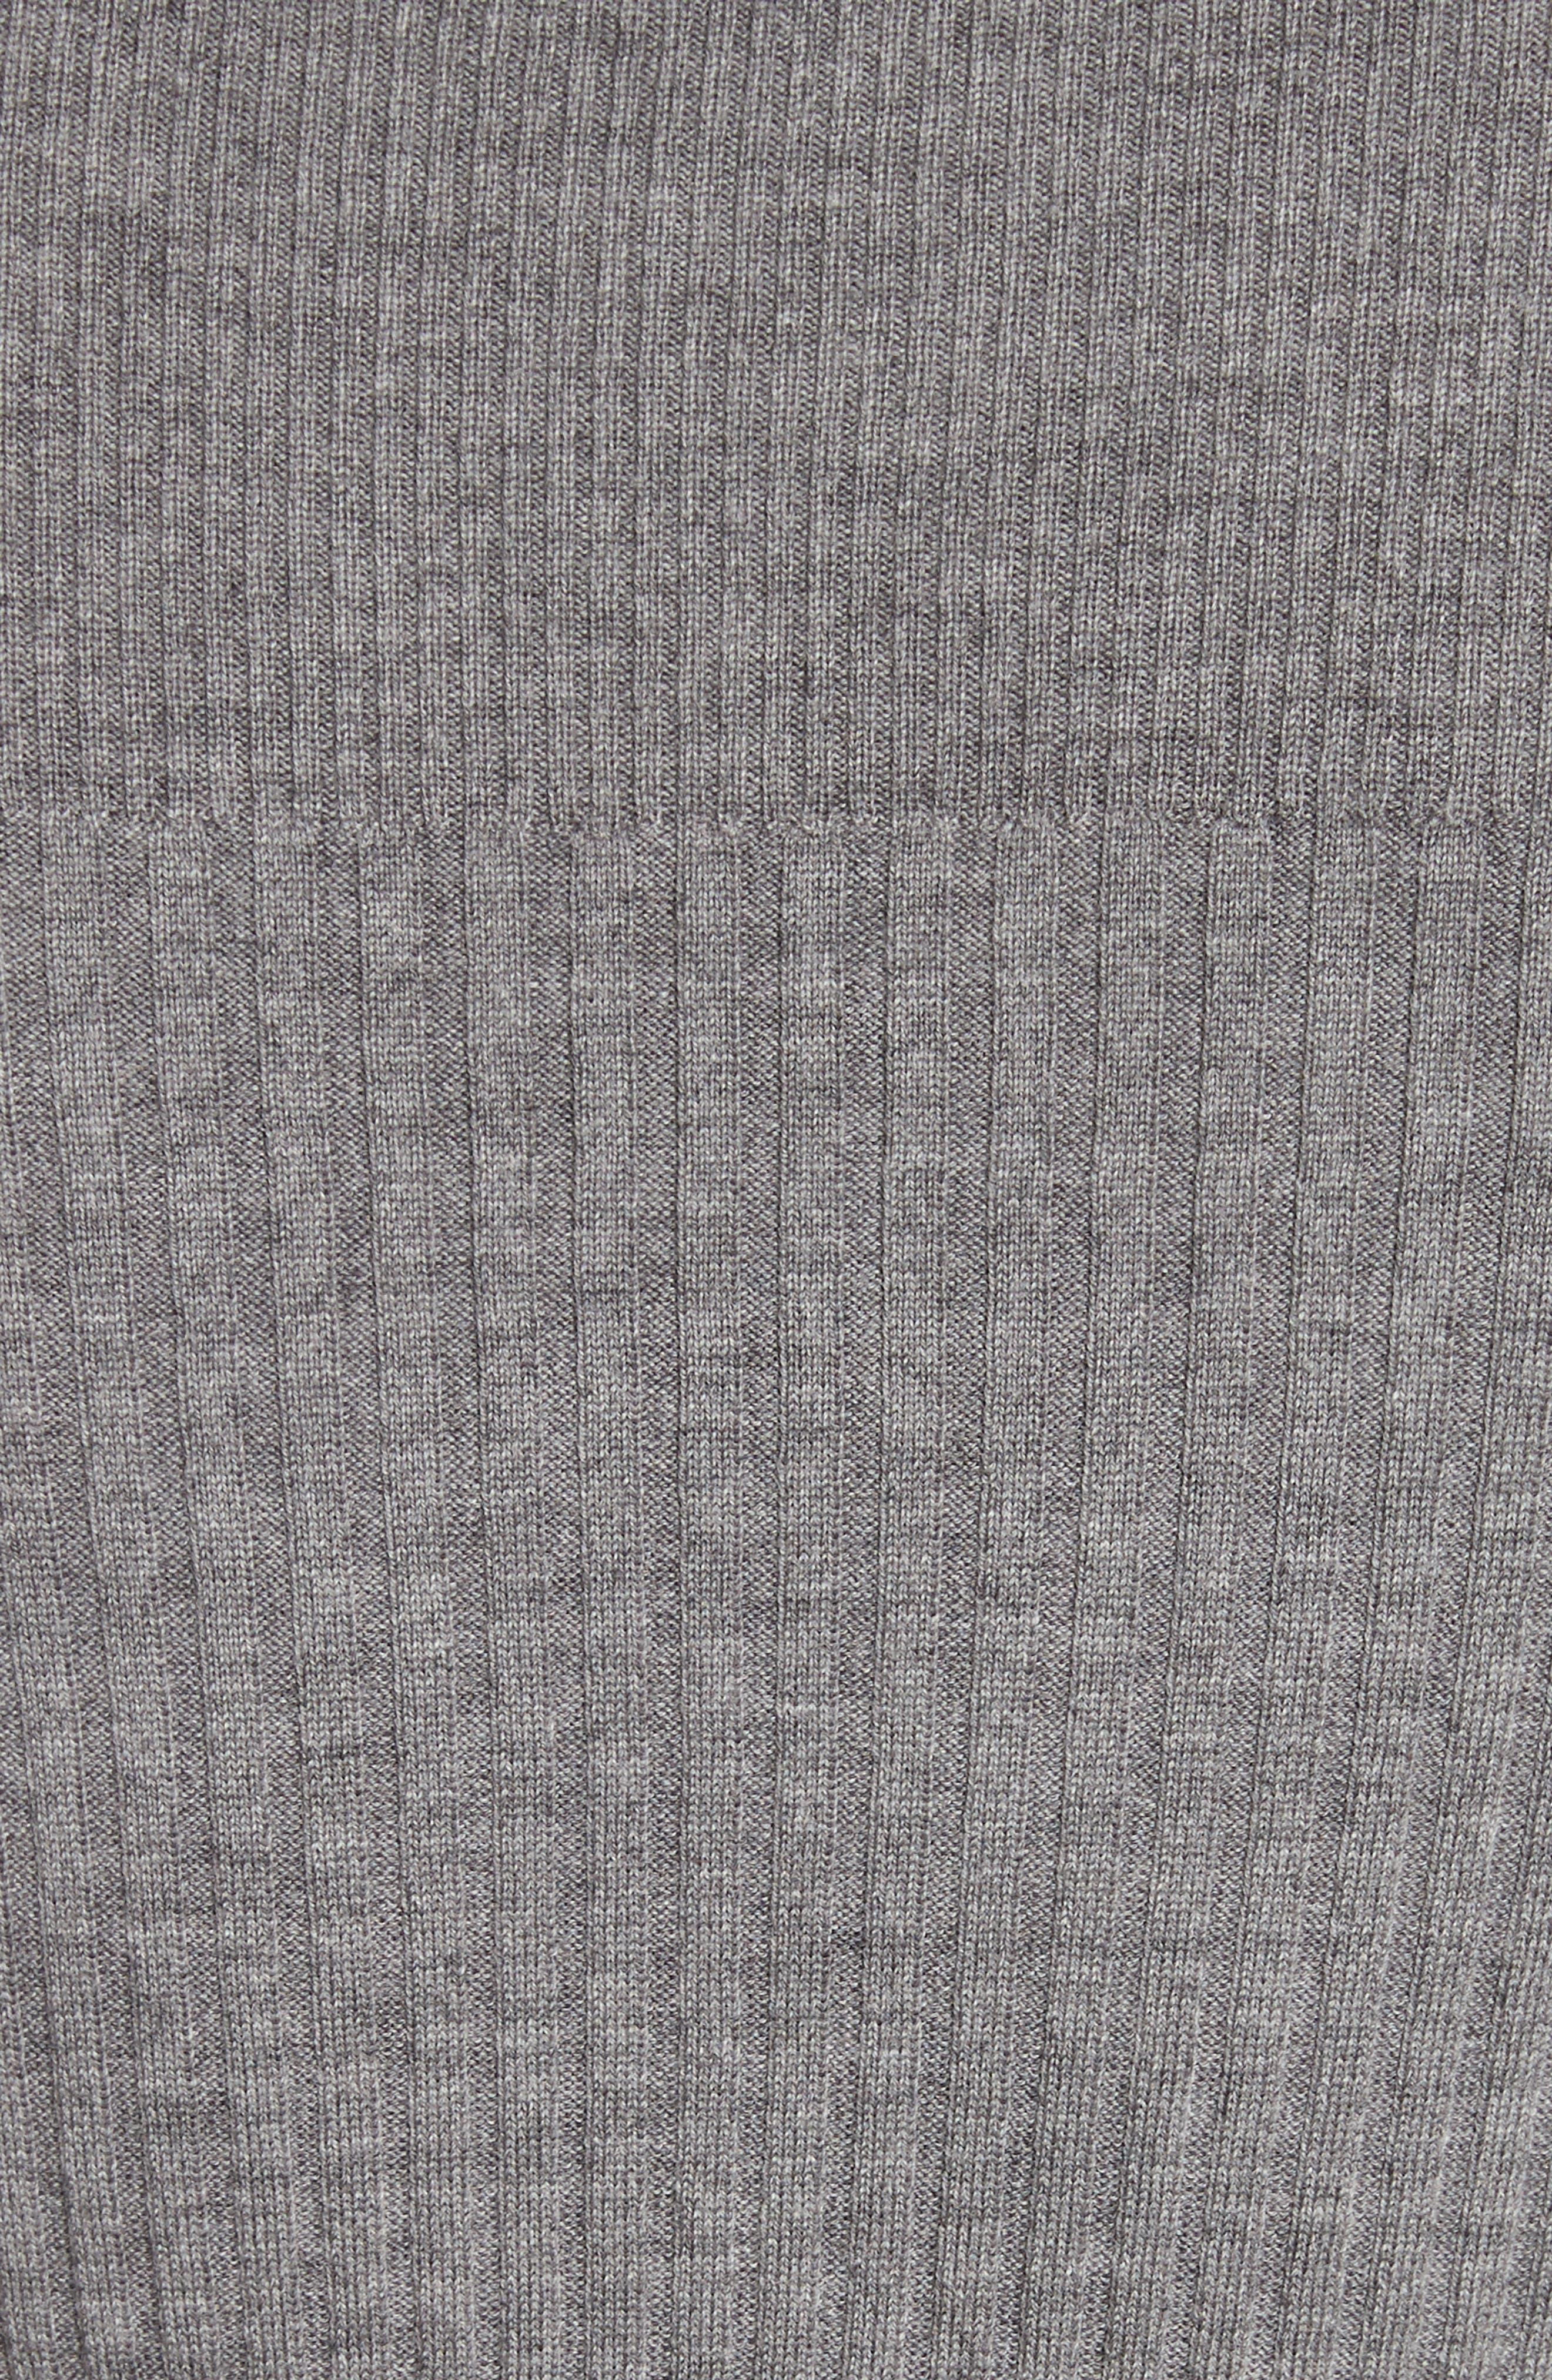 Merino Wool Sweater,                             Alternate thumbnail 5, color,                             030